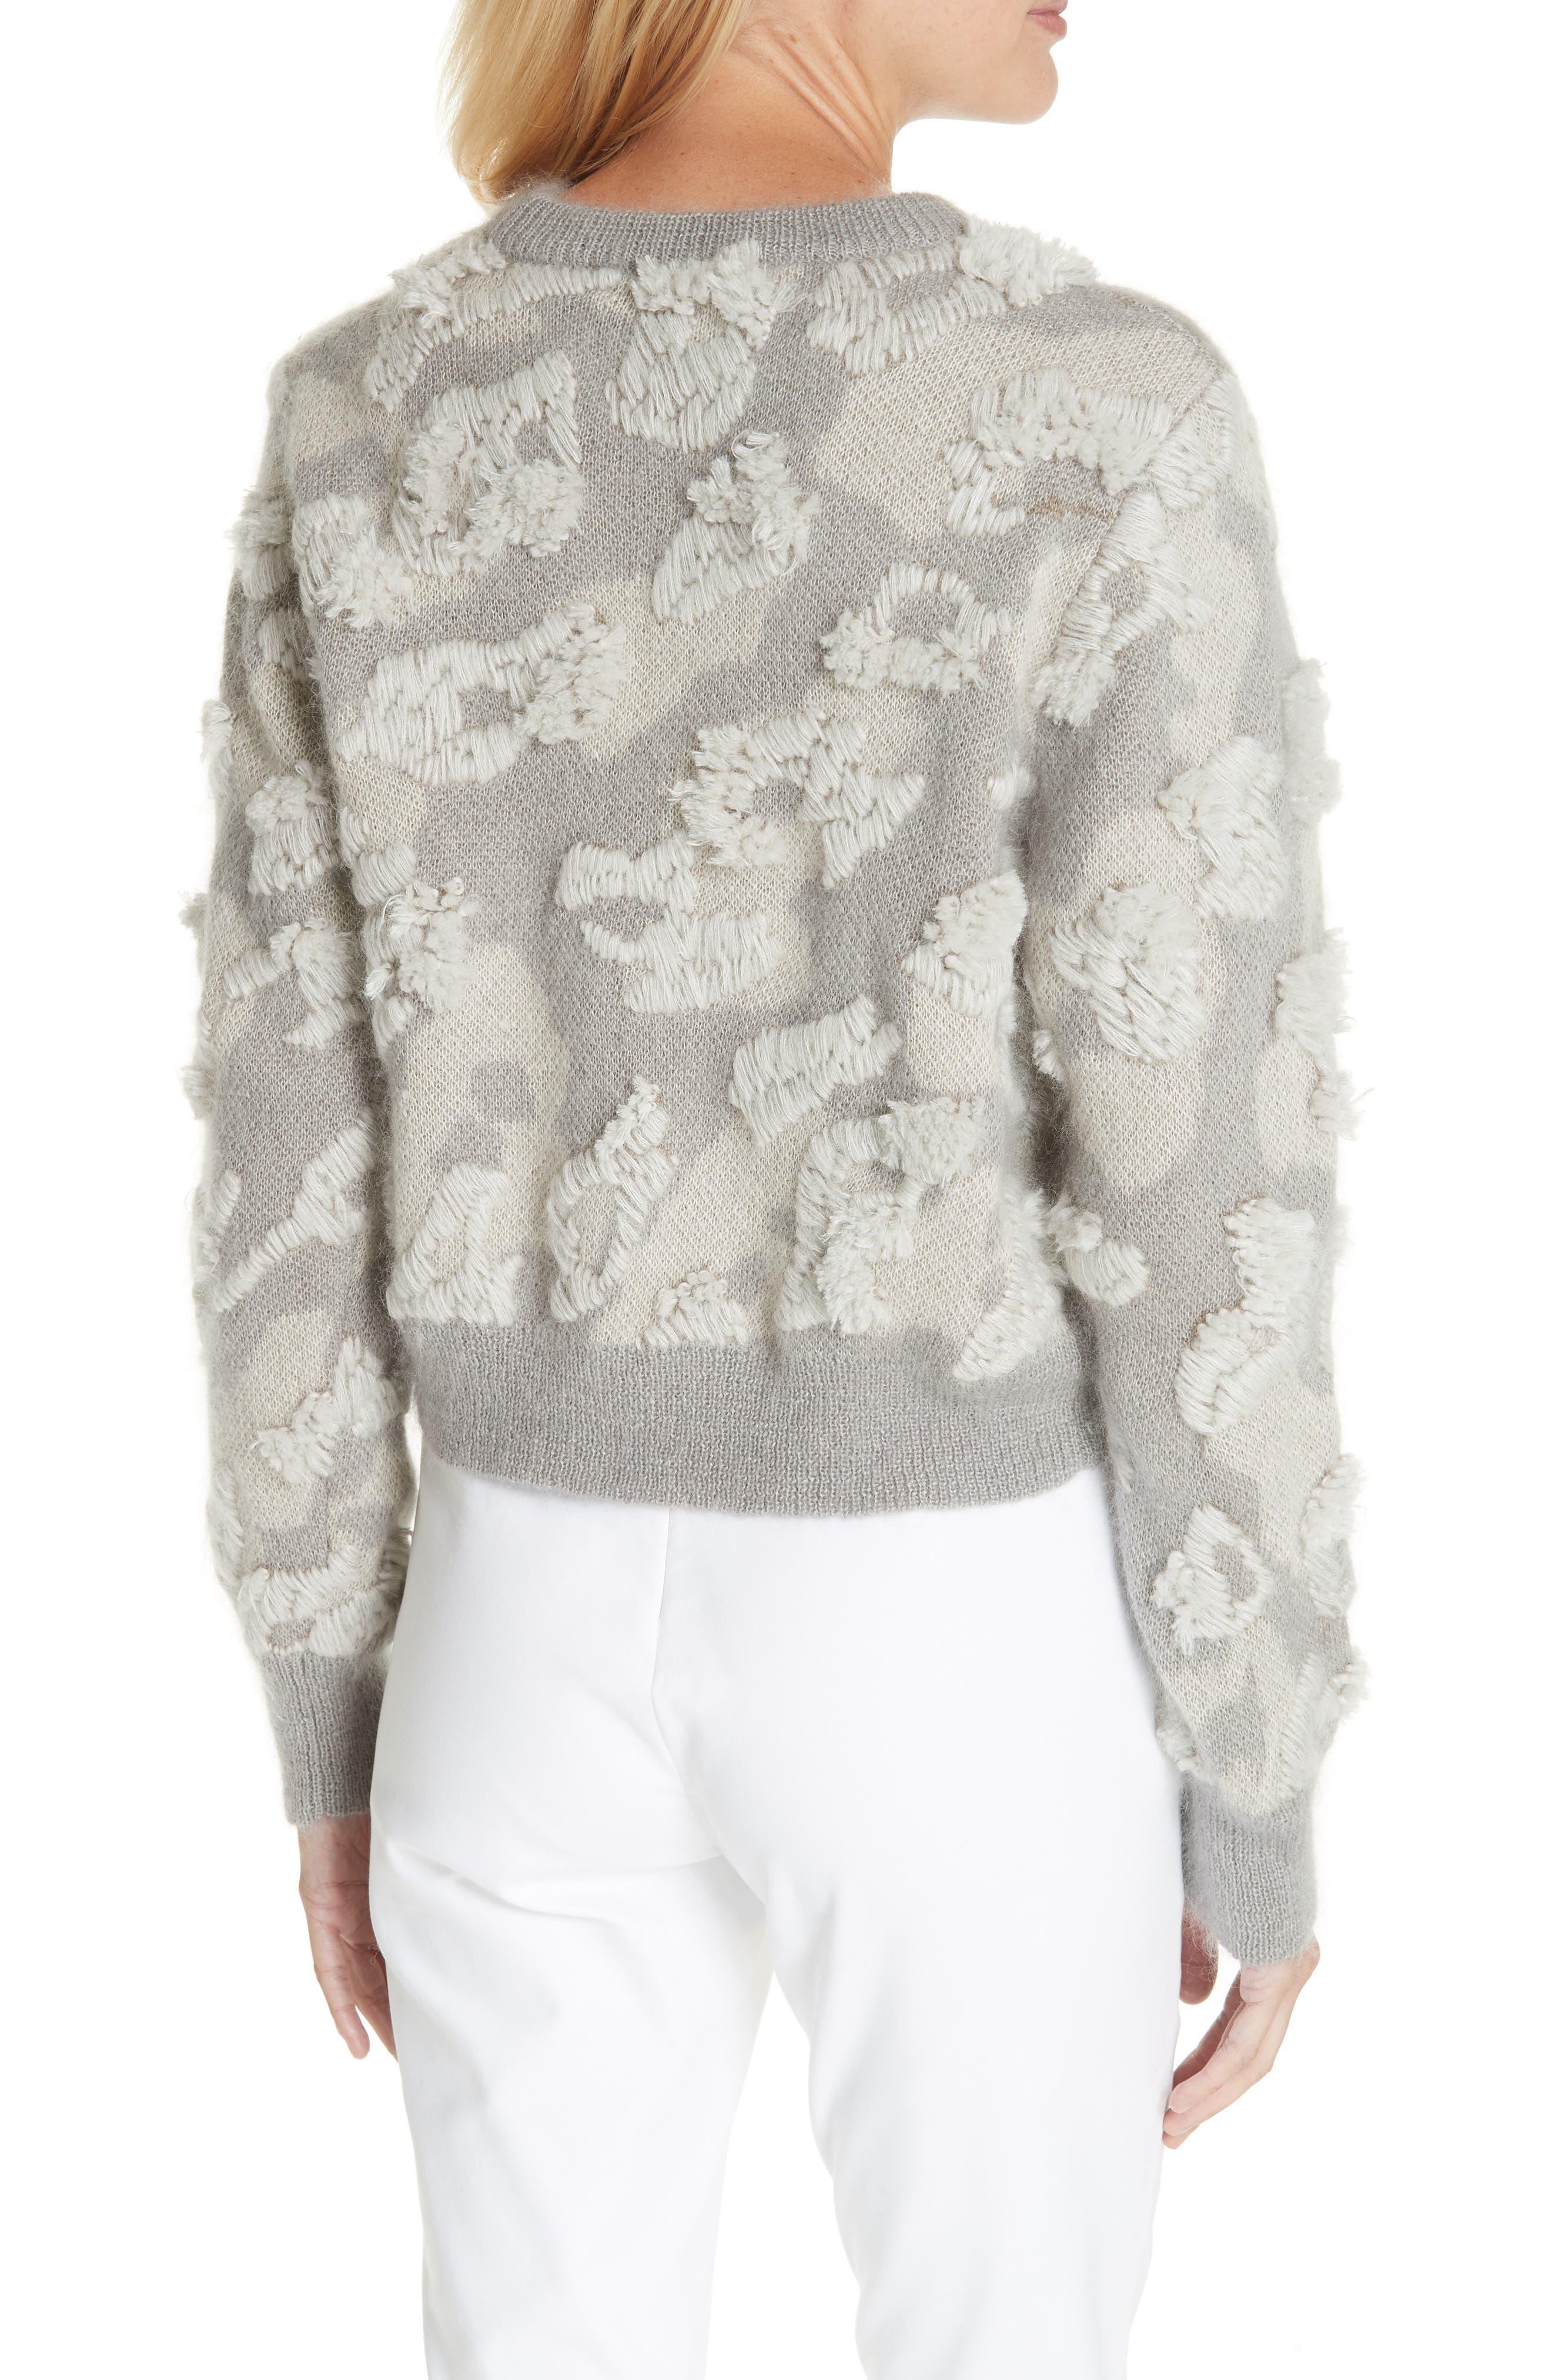 RAG & BONE,                             Embroidered Leopard Spot Sweater,                             Alternate thumbnail 2, color,                             900